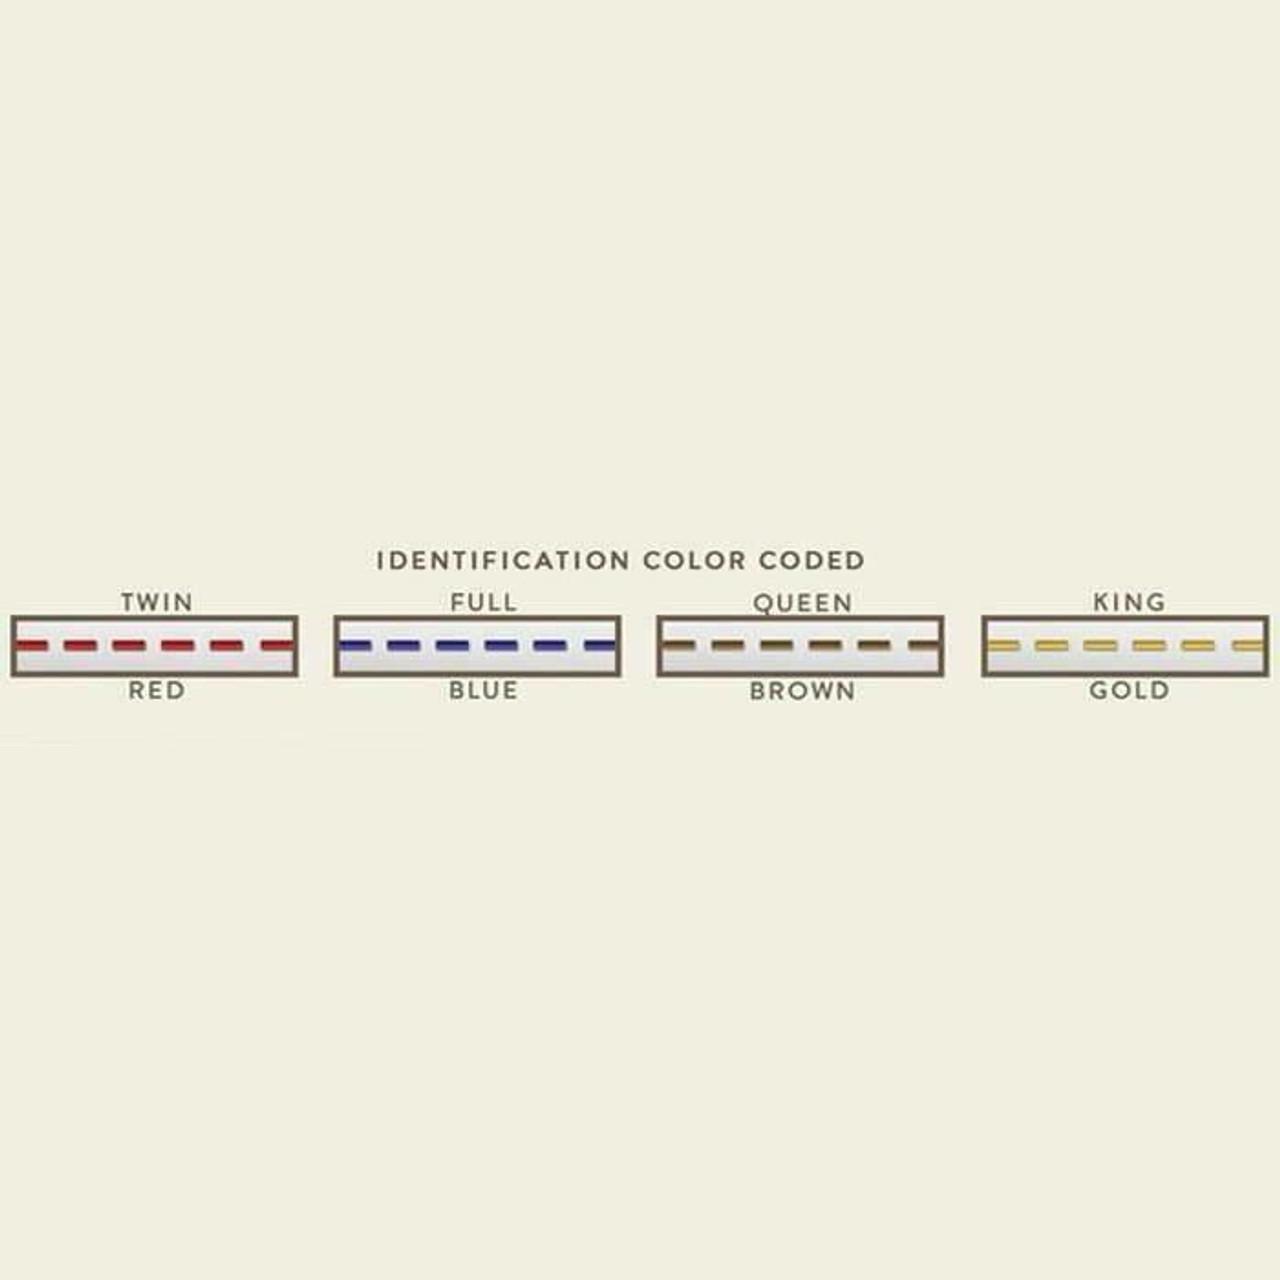 Ganesh Mills or Oxford Super Blend Ganesh Mills or Oxford Super T-300 - All Sizes